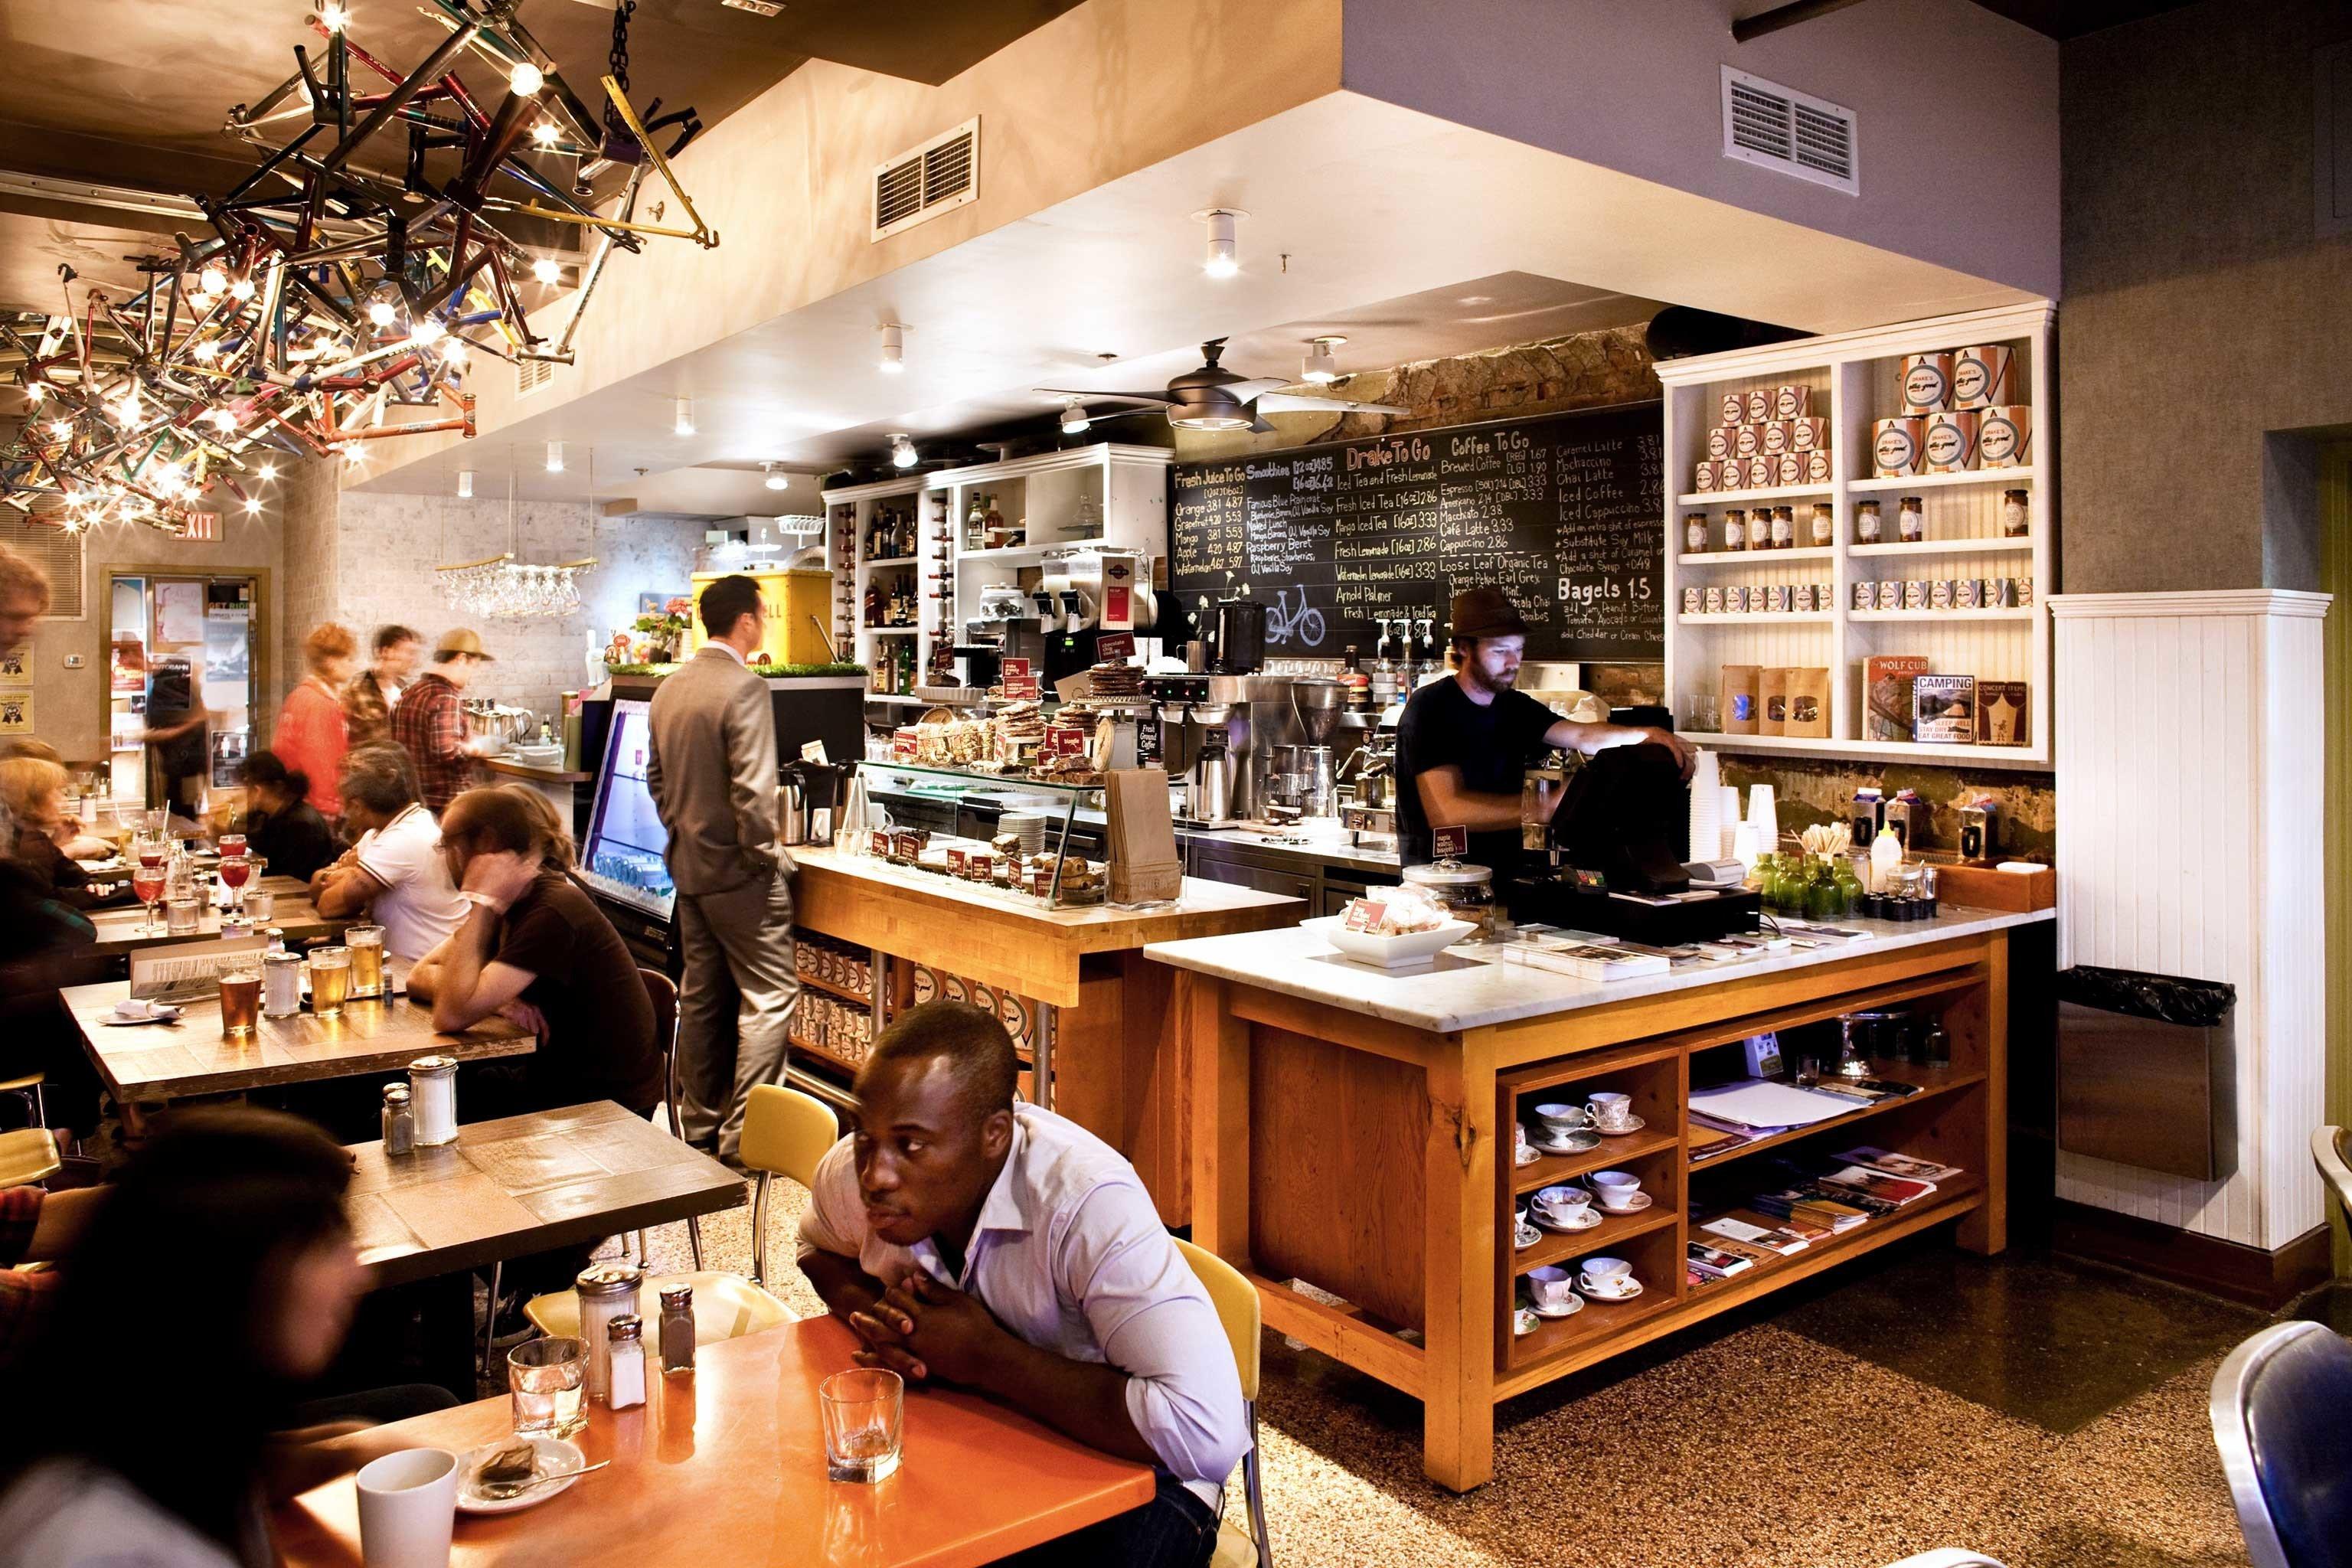 Boutique City Drink Eat Hip Modern restaurant Bar cluttered